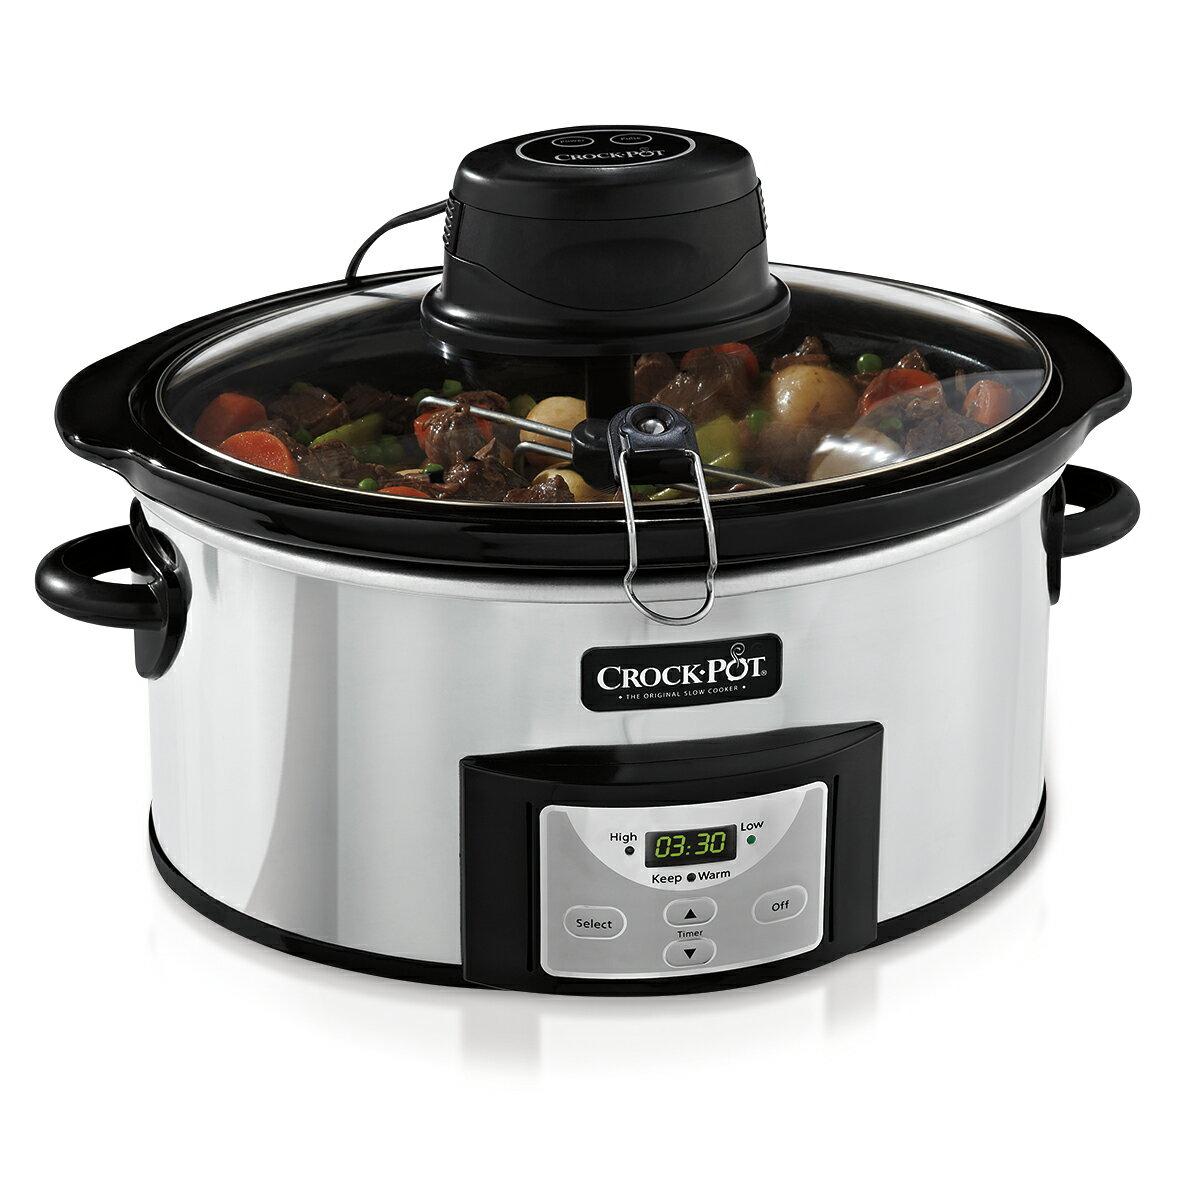 Crock-Pot 6-Quart Digital Slow Cooker with iStir™ Stirring System SCCPVC600AS-P 0